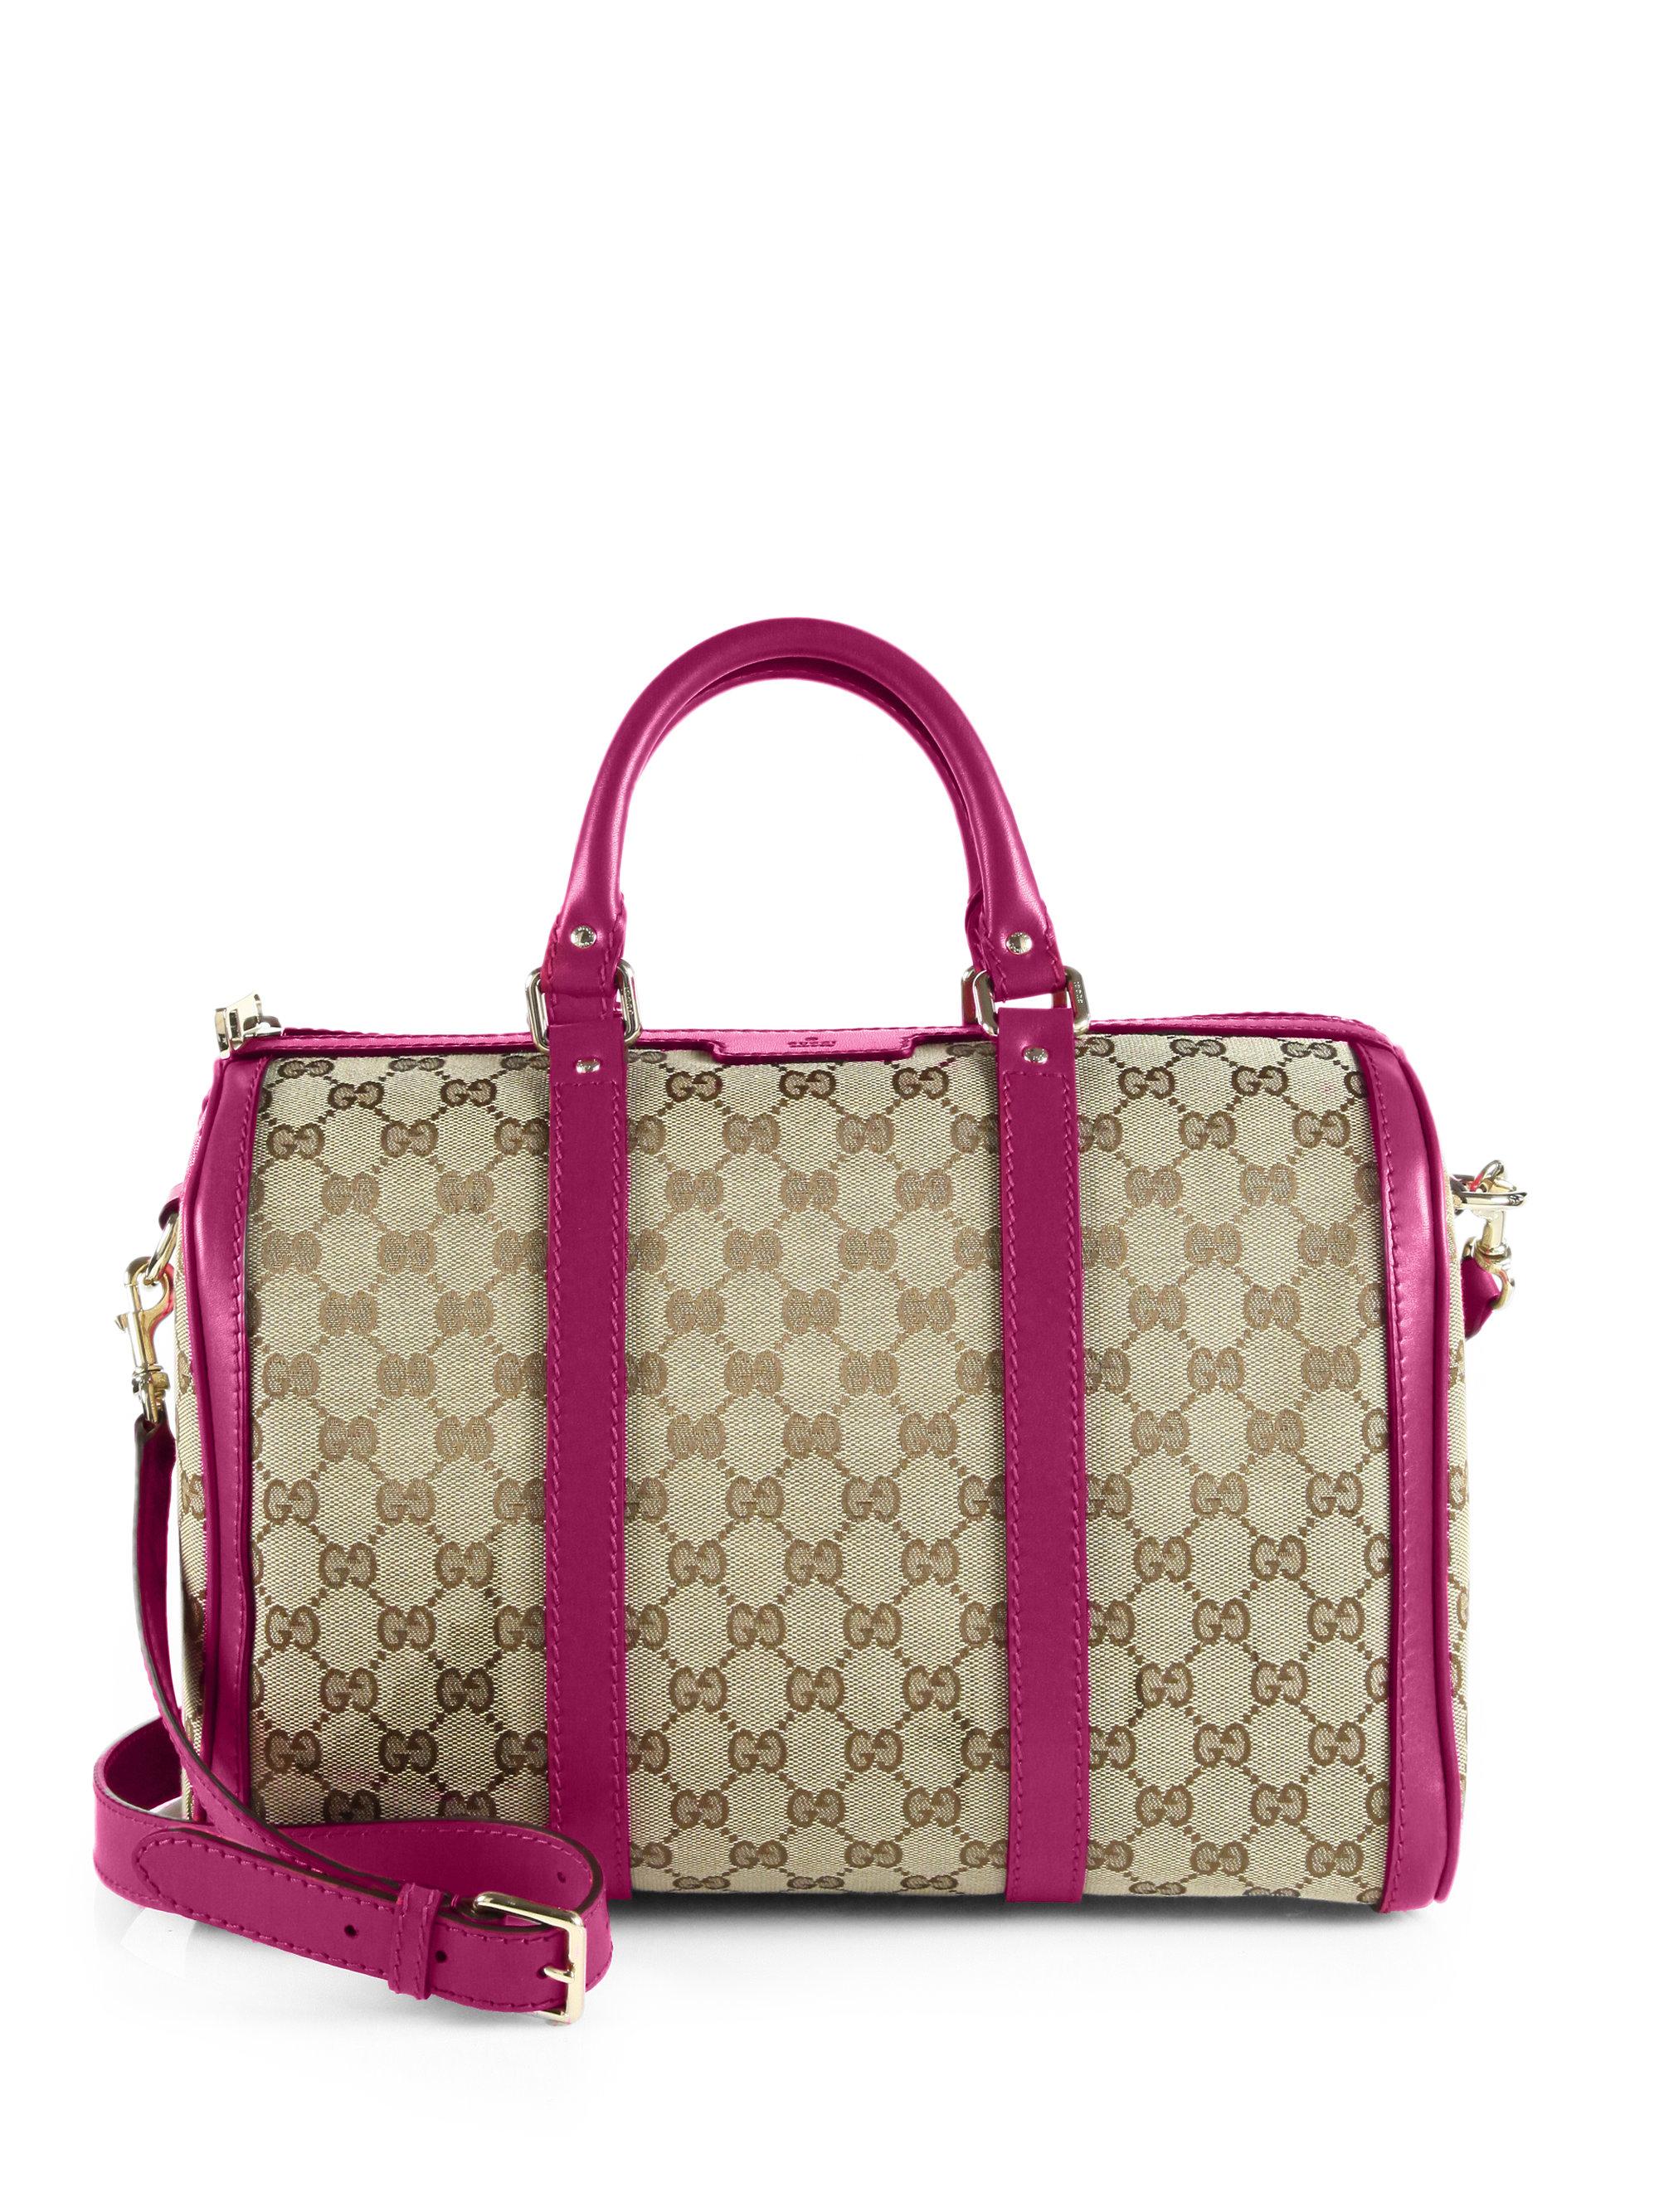 Lyst - Gucci Vintage Web Original GG Canvas Boston Bag in Pink